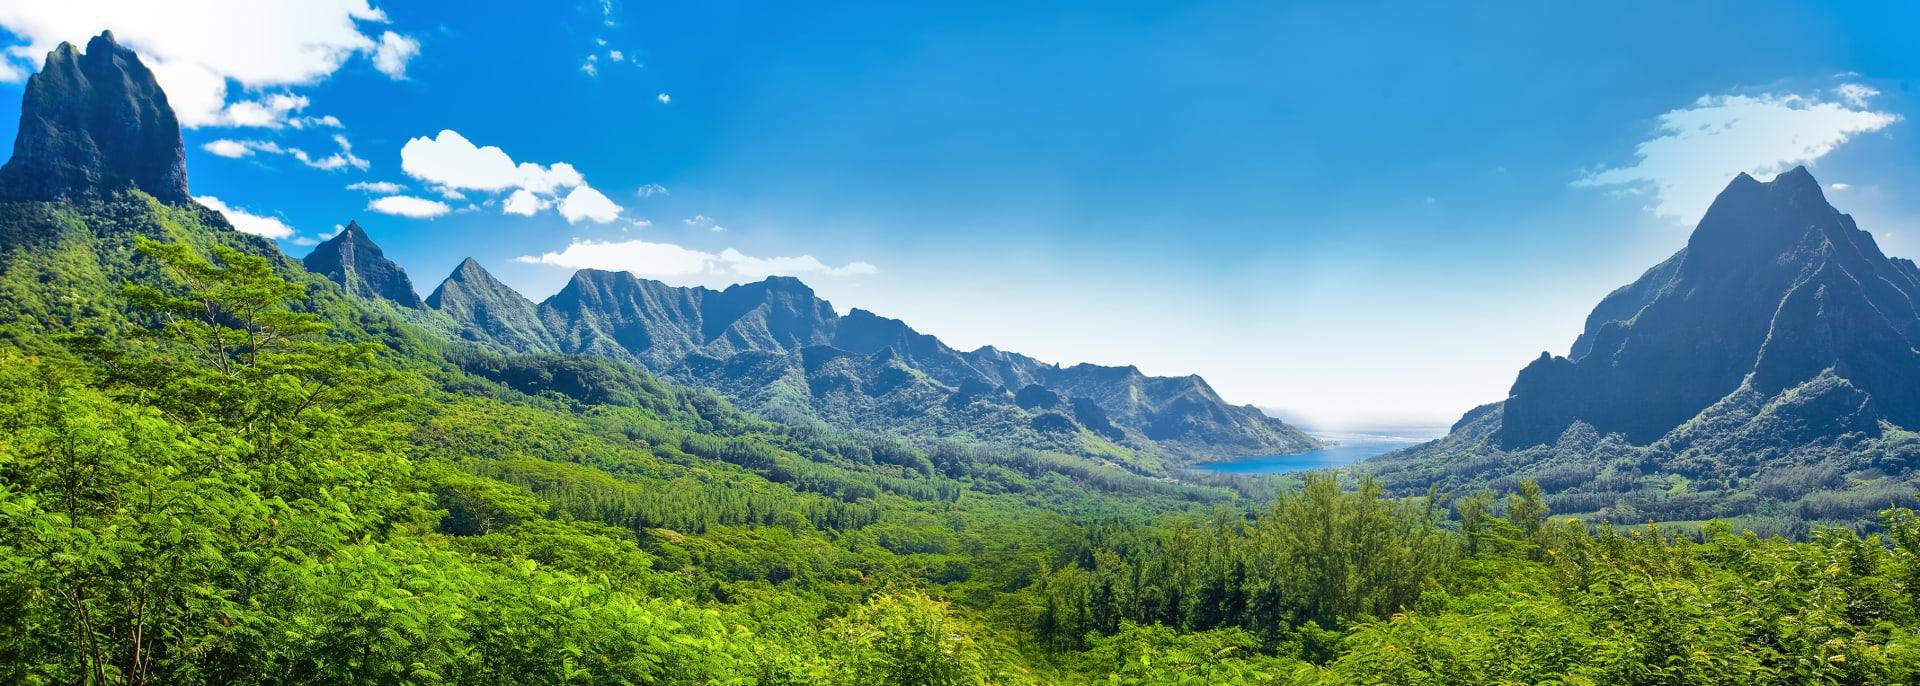 Moorea, Französisch Polynesien